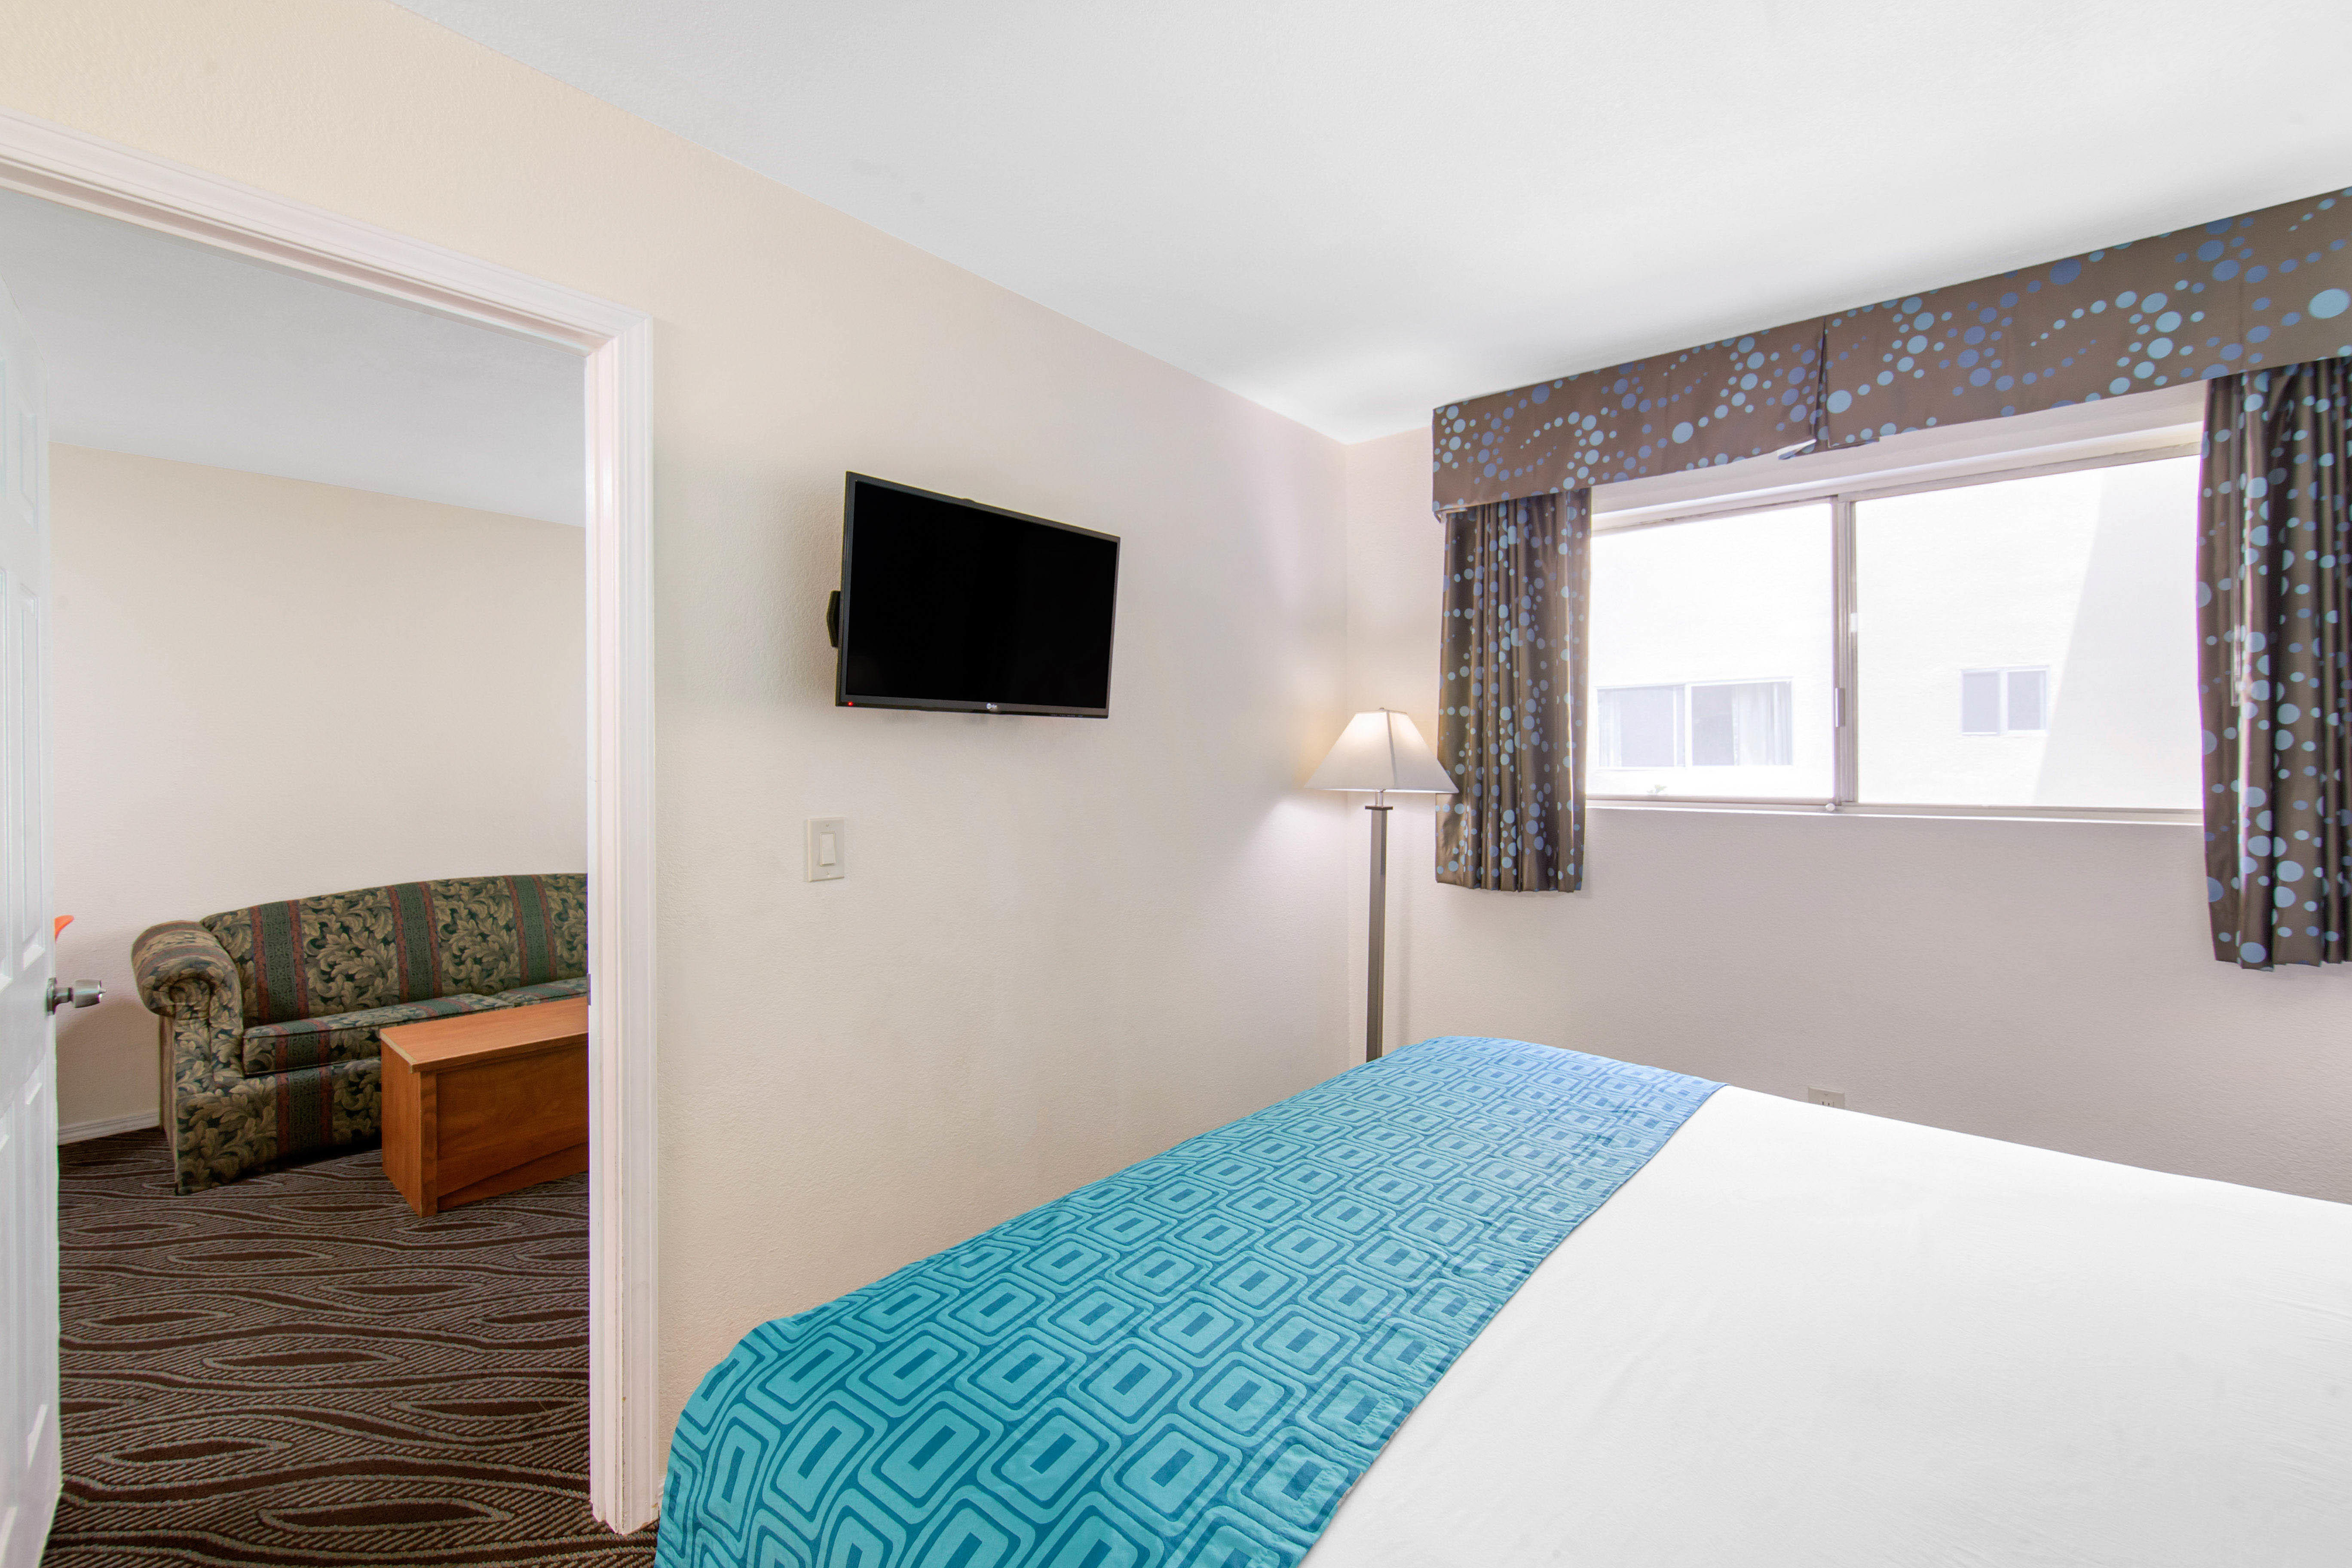 Howard Johnson by Wyndham Chula Vista San Diego Suite Hotel image 19